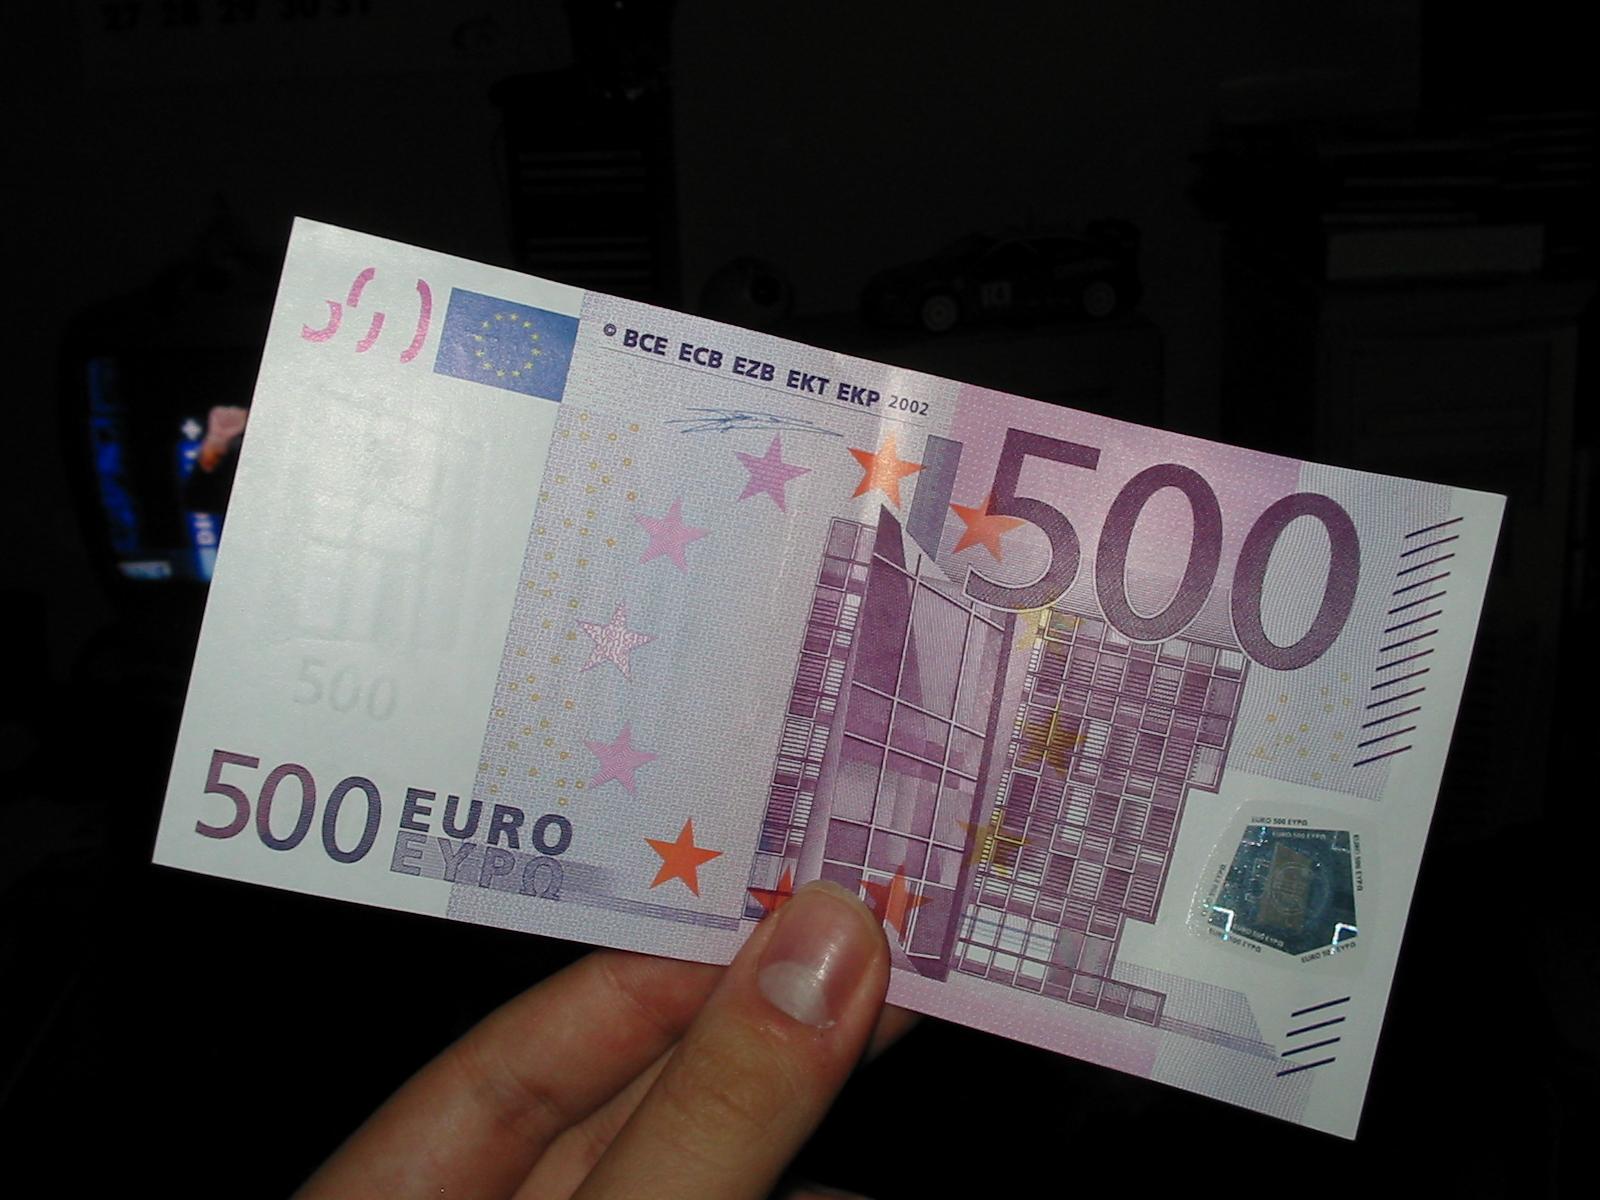 File:Nota 500 euros.jpg - Wikimedia Commons